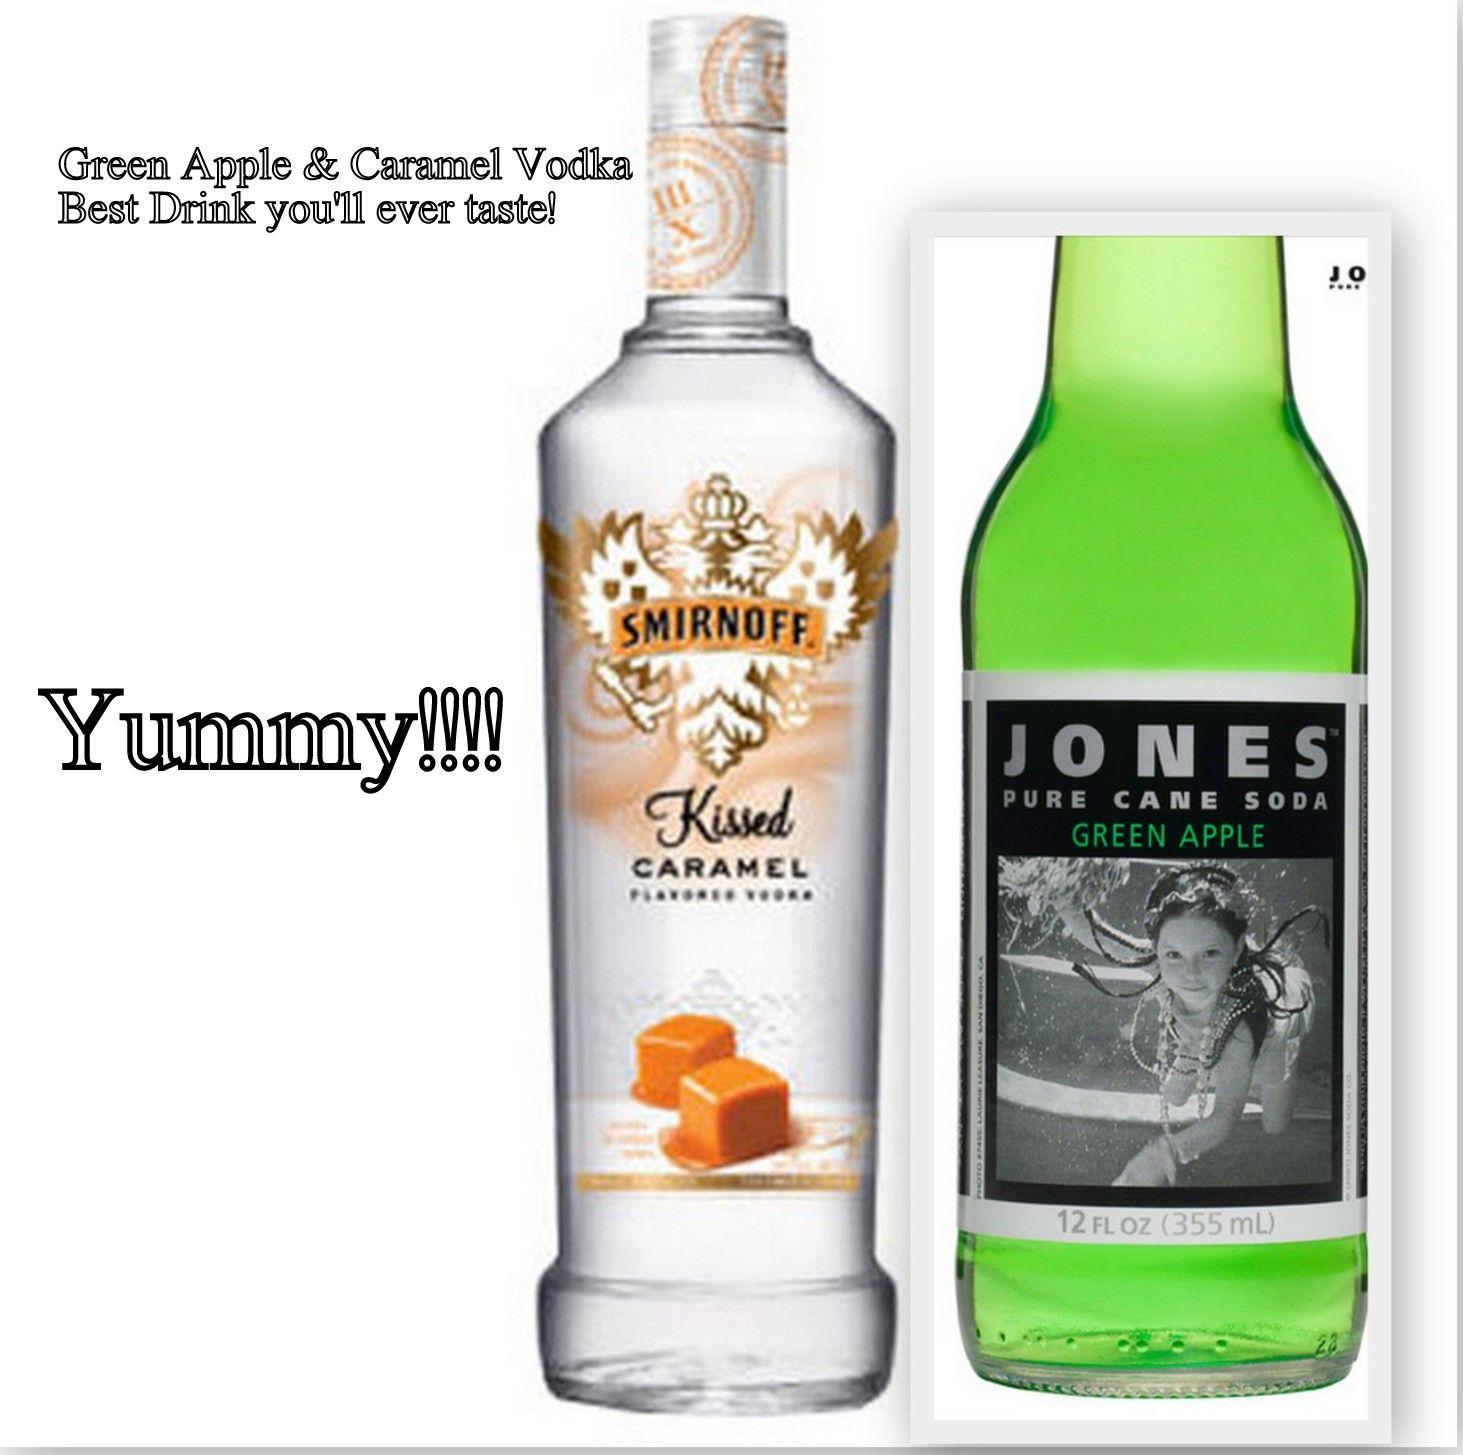 Green Apple Jones Drink And Caramel Vodka, Best Holiday